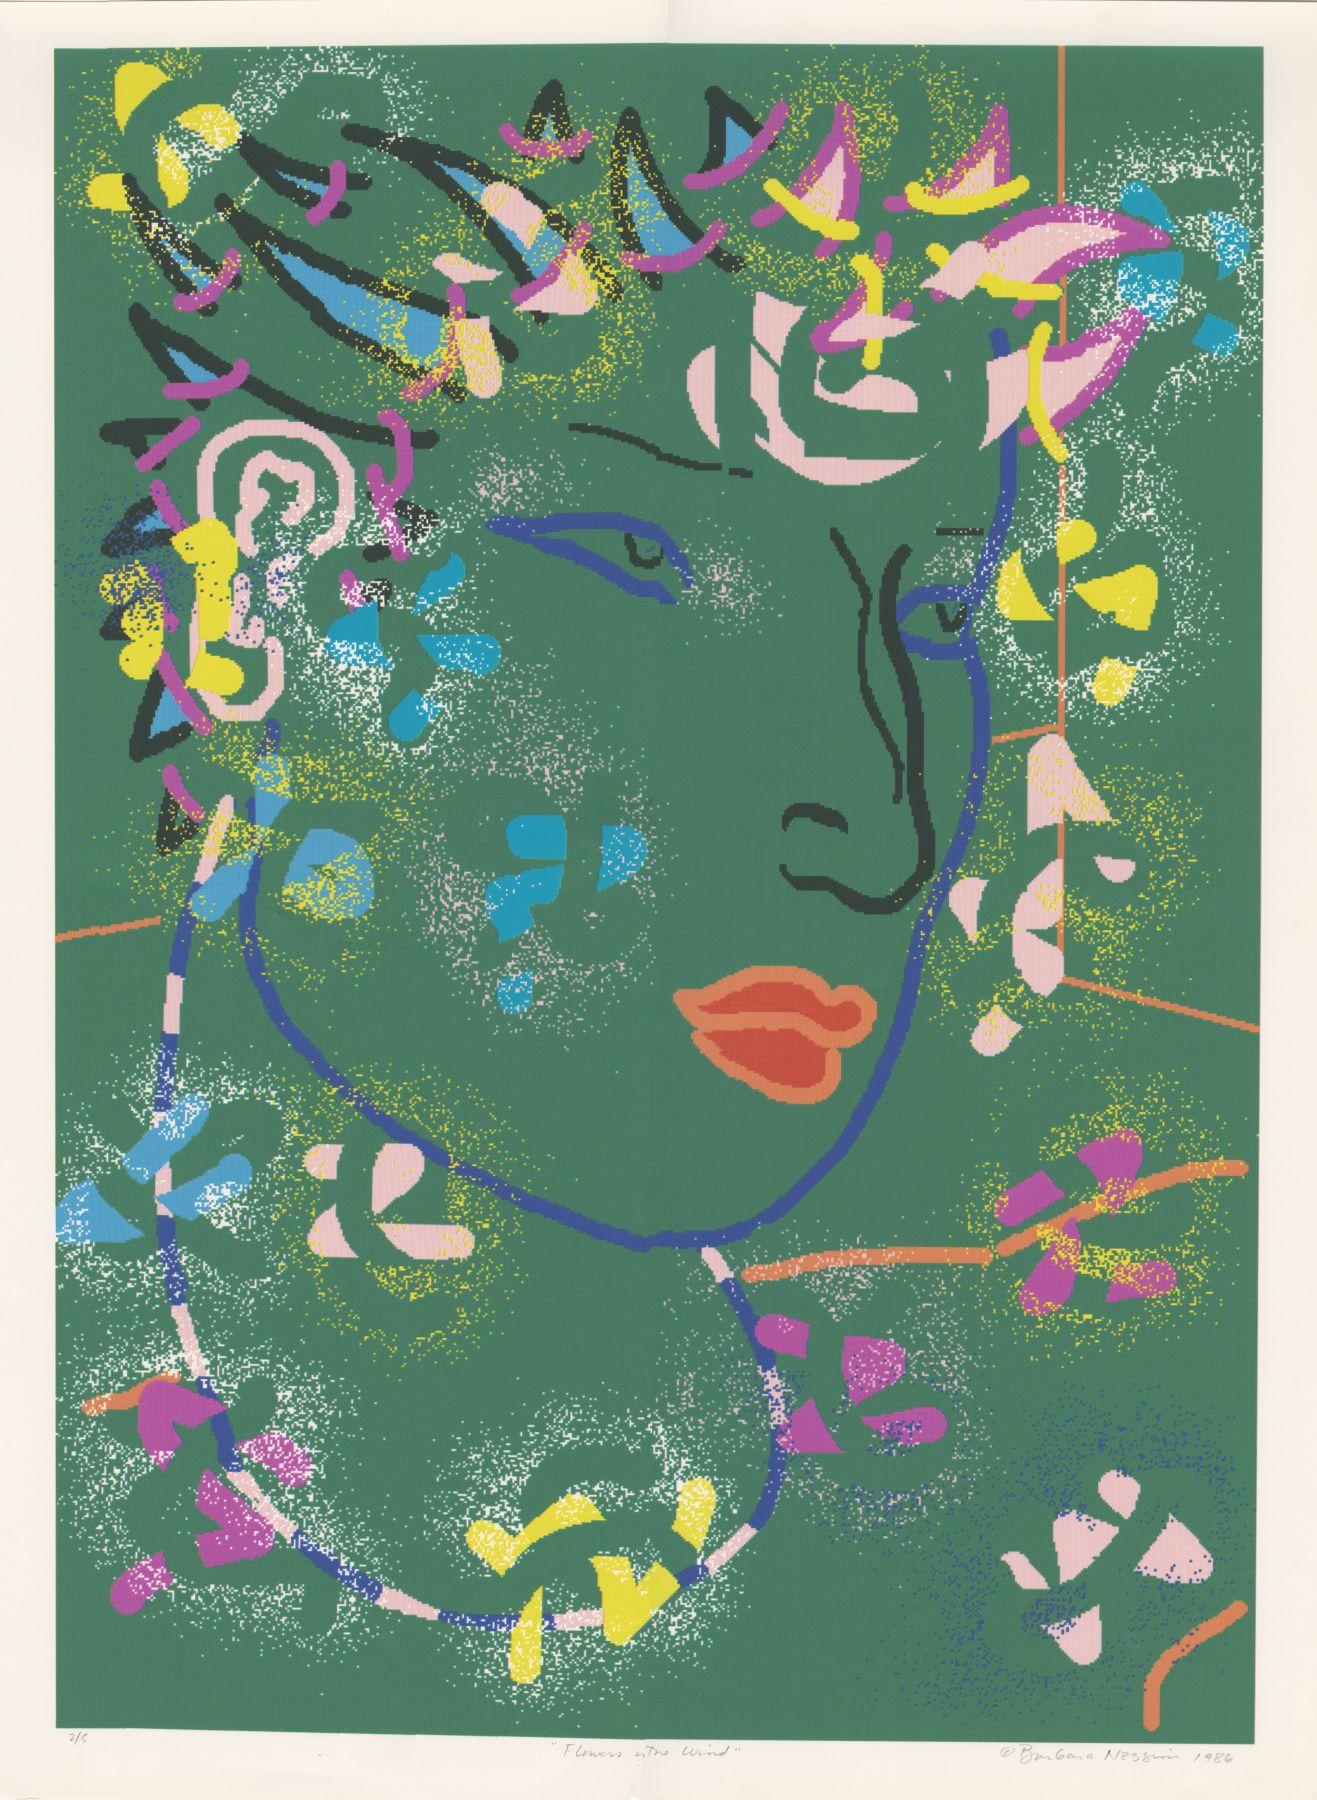 Barbara Nessim - Flowers in the Wind